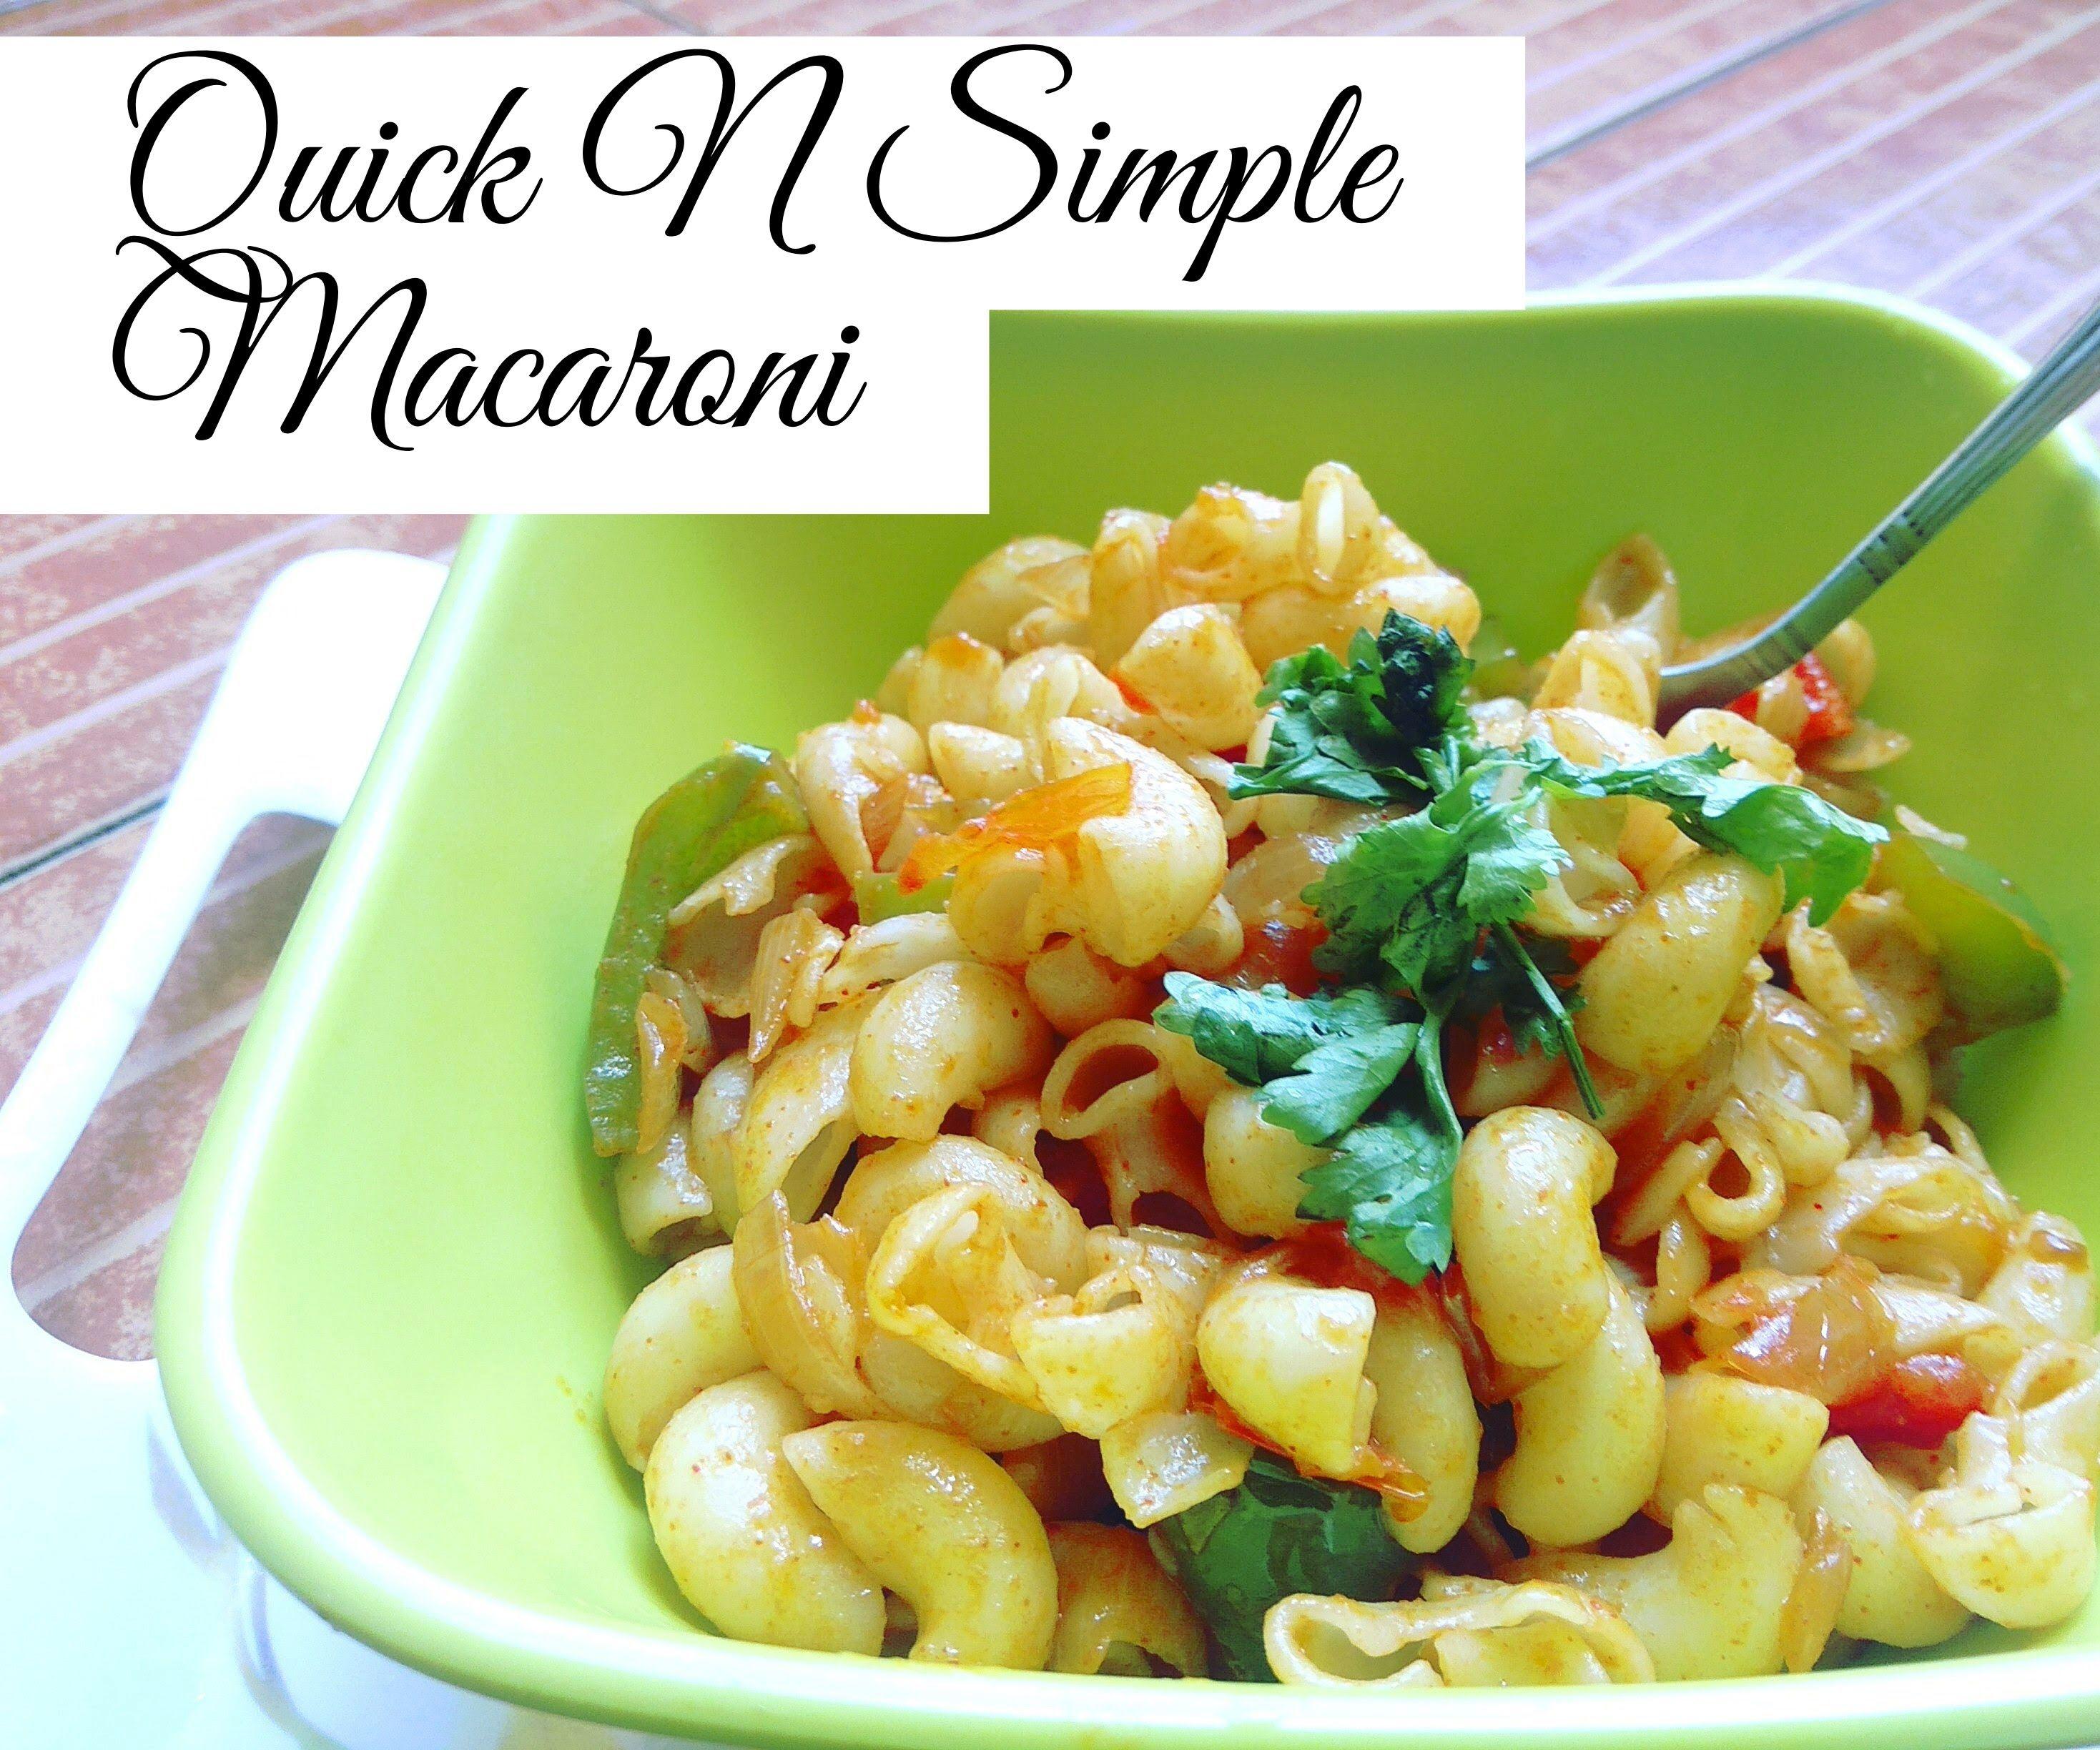 Quick Veggie Macaroni